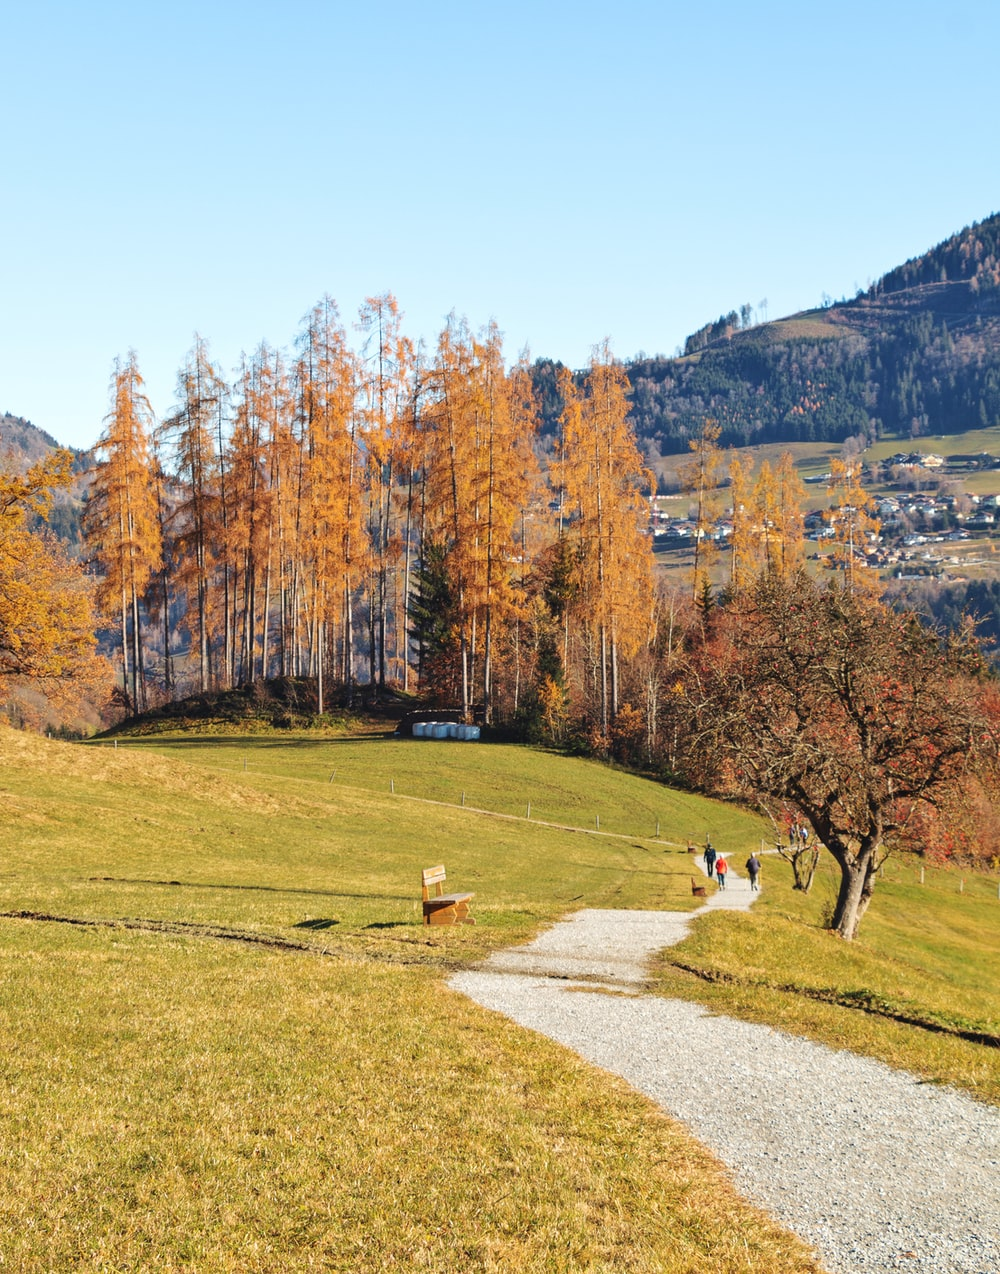 people walking on pathway near trees during daytime